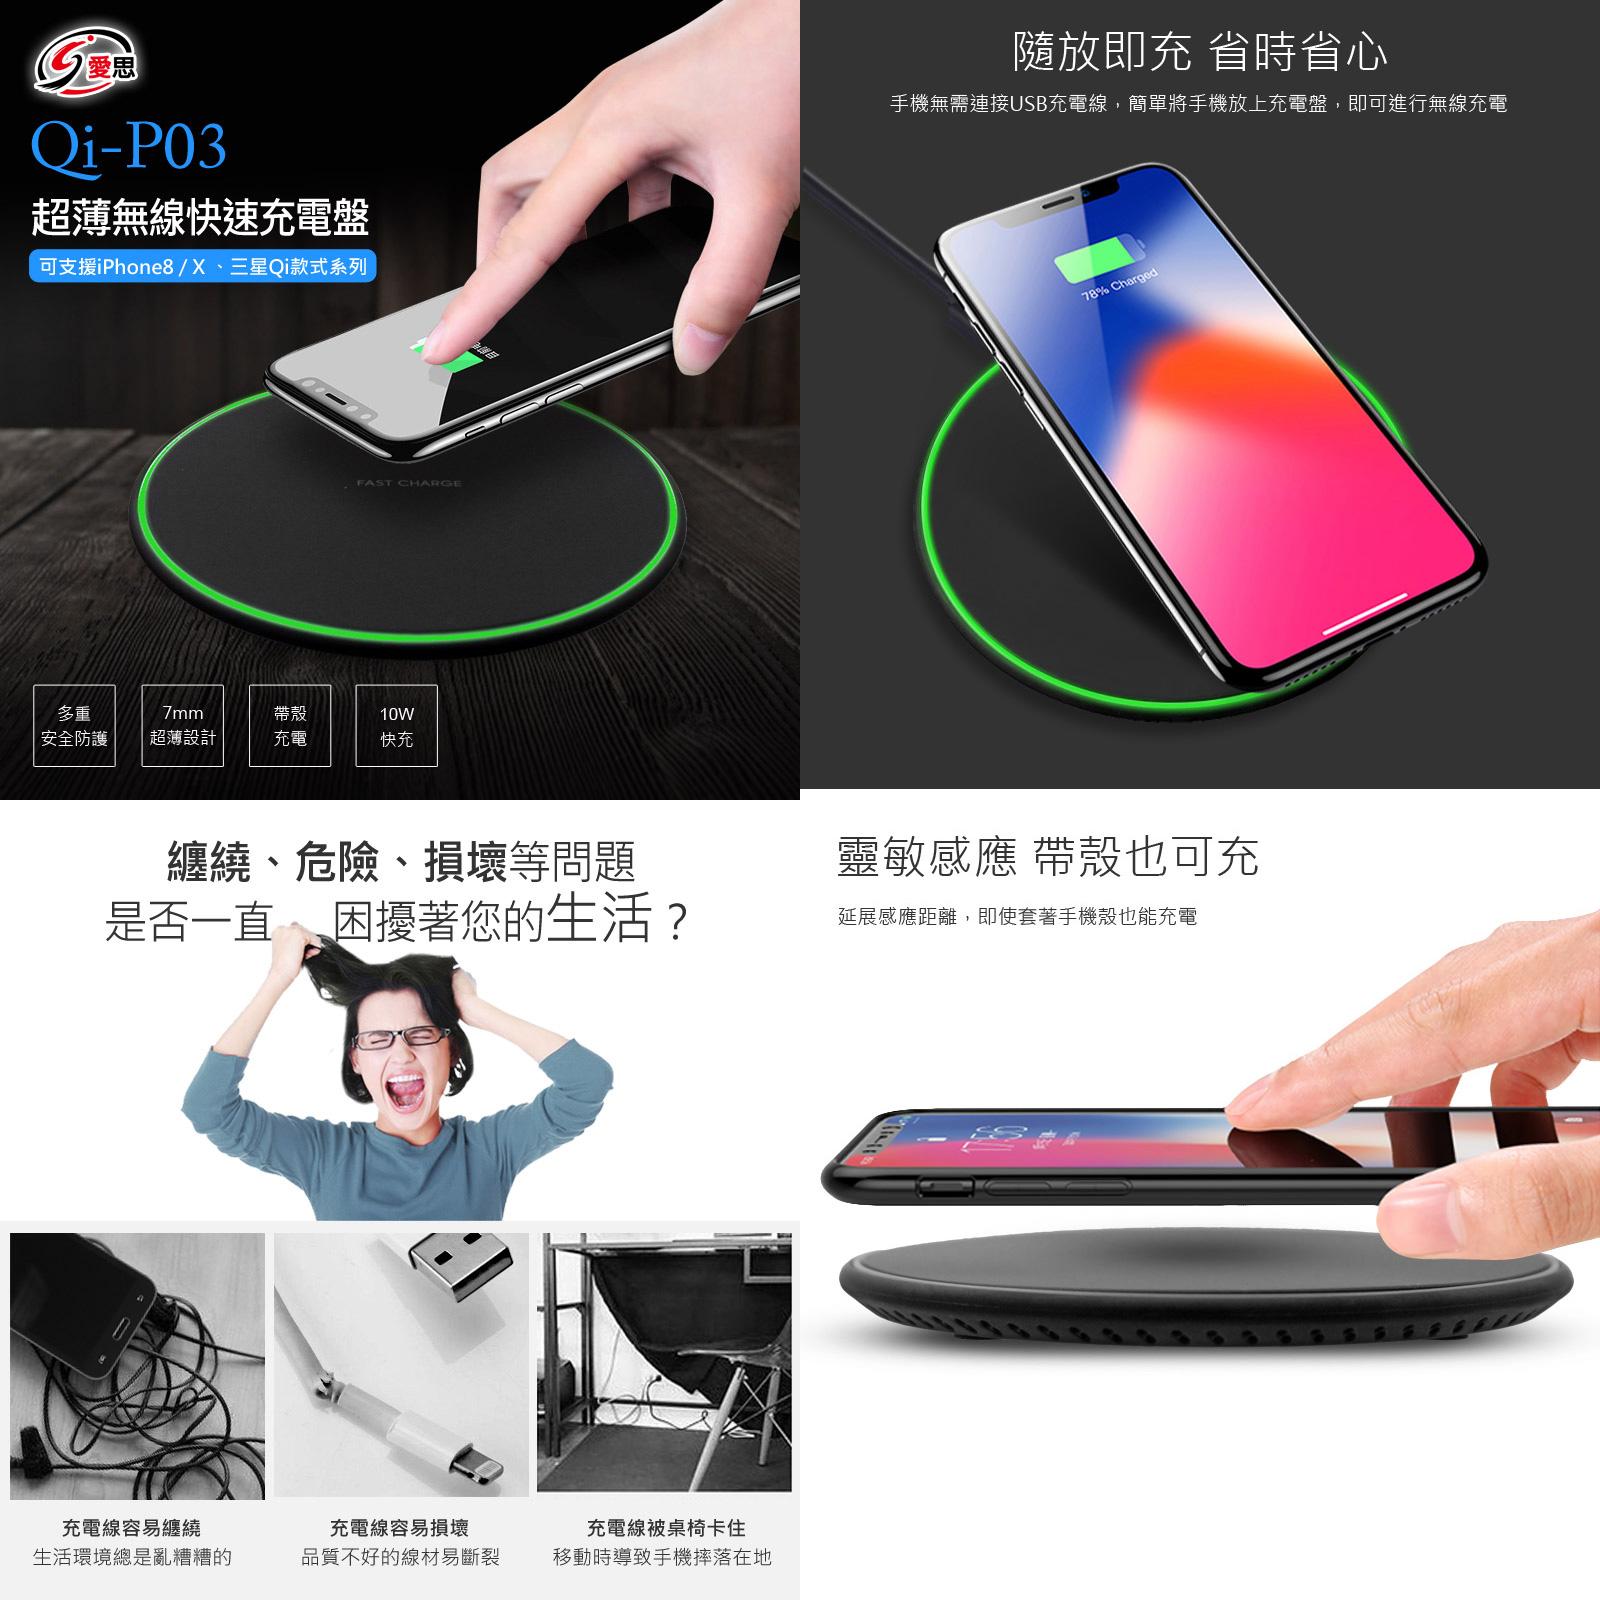 IS愛思 Qi-P03超薄無線快速充電盤 10W快充 無線充電器